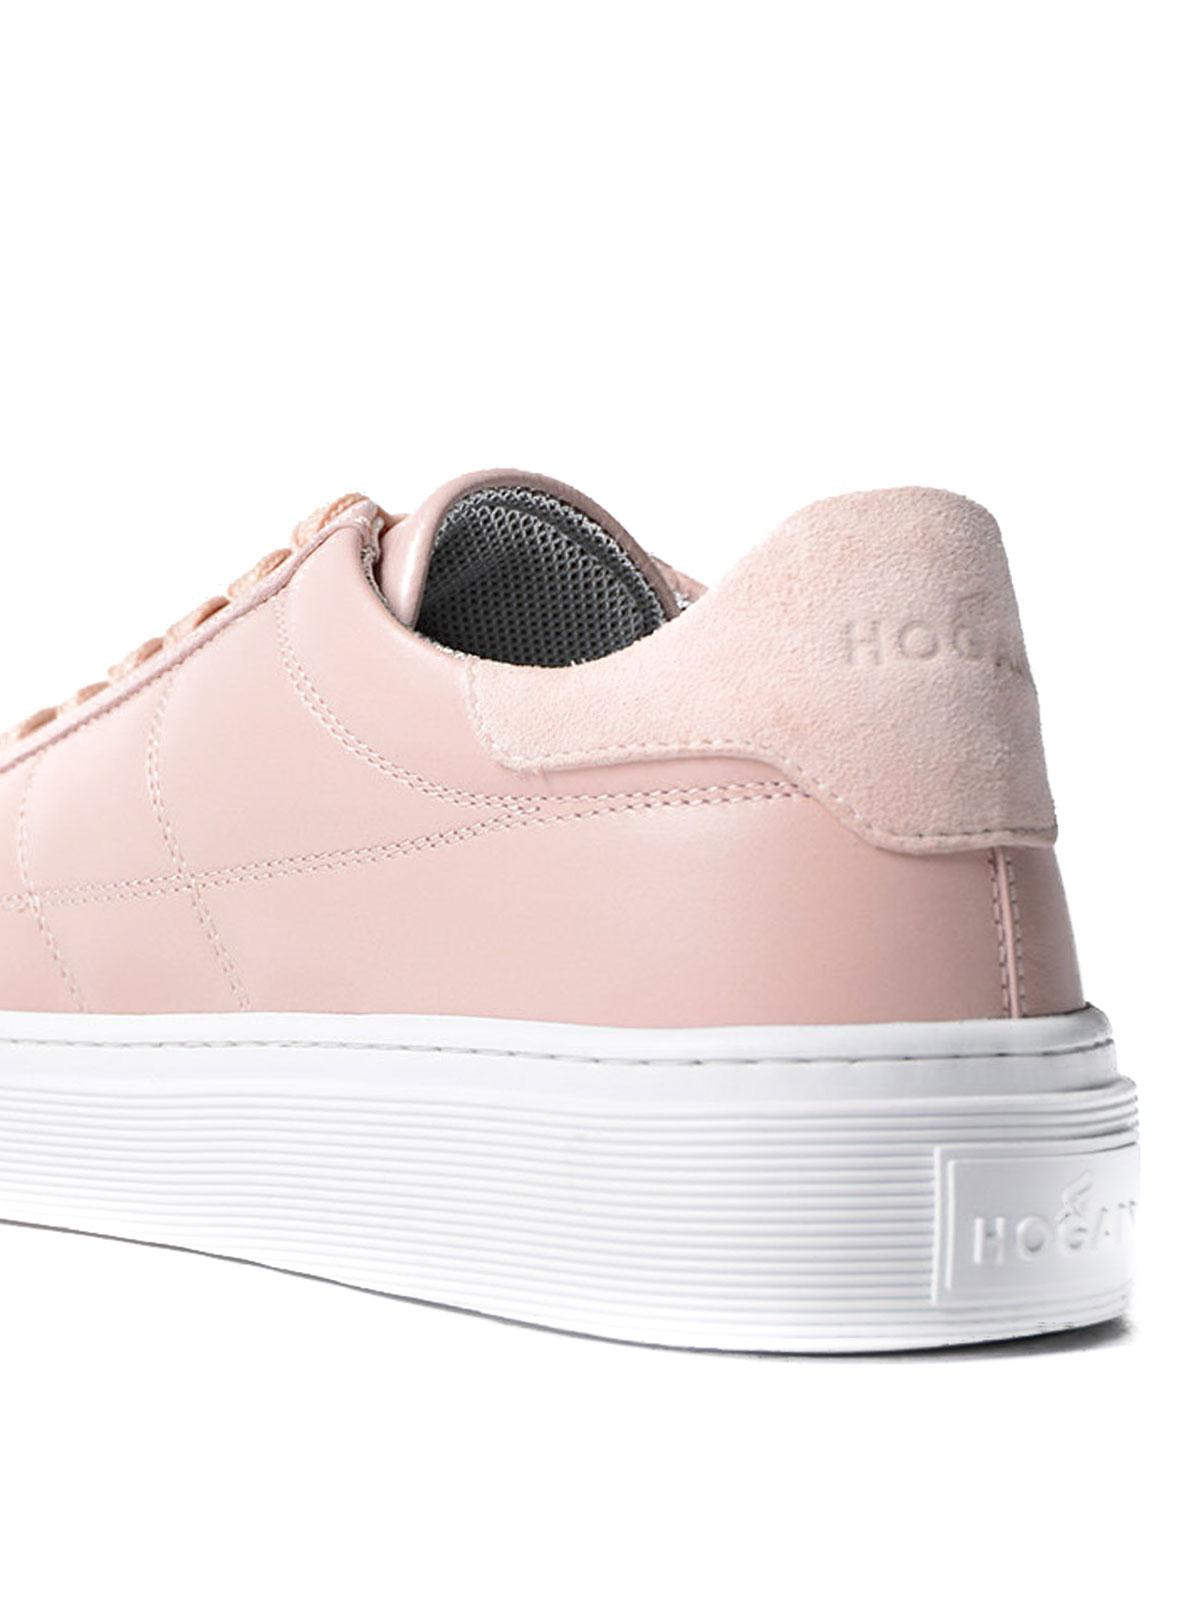 Hogan - Sneaker H340 rosa in pelle - sneakers - HXW3400J280C7HM413